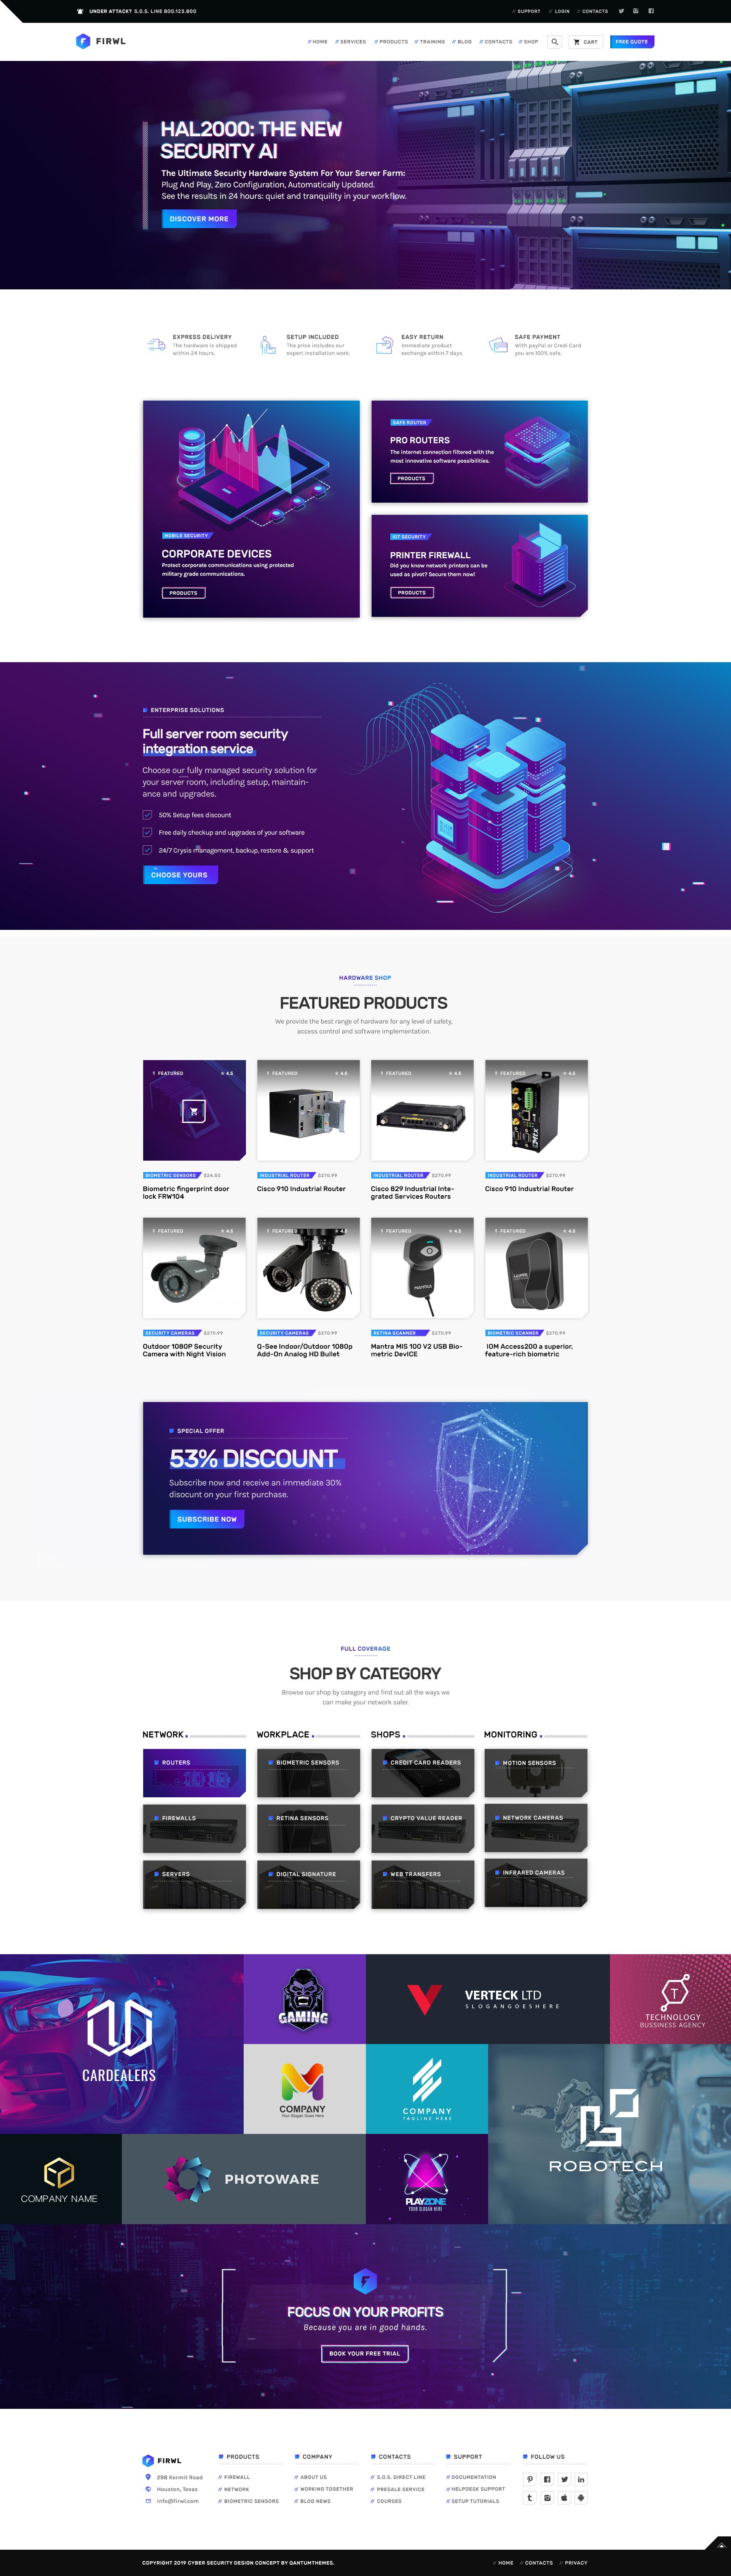 Firwl - Cyber Security PSD Website Template